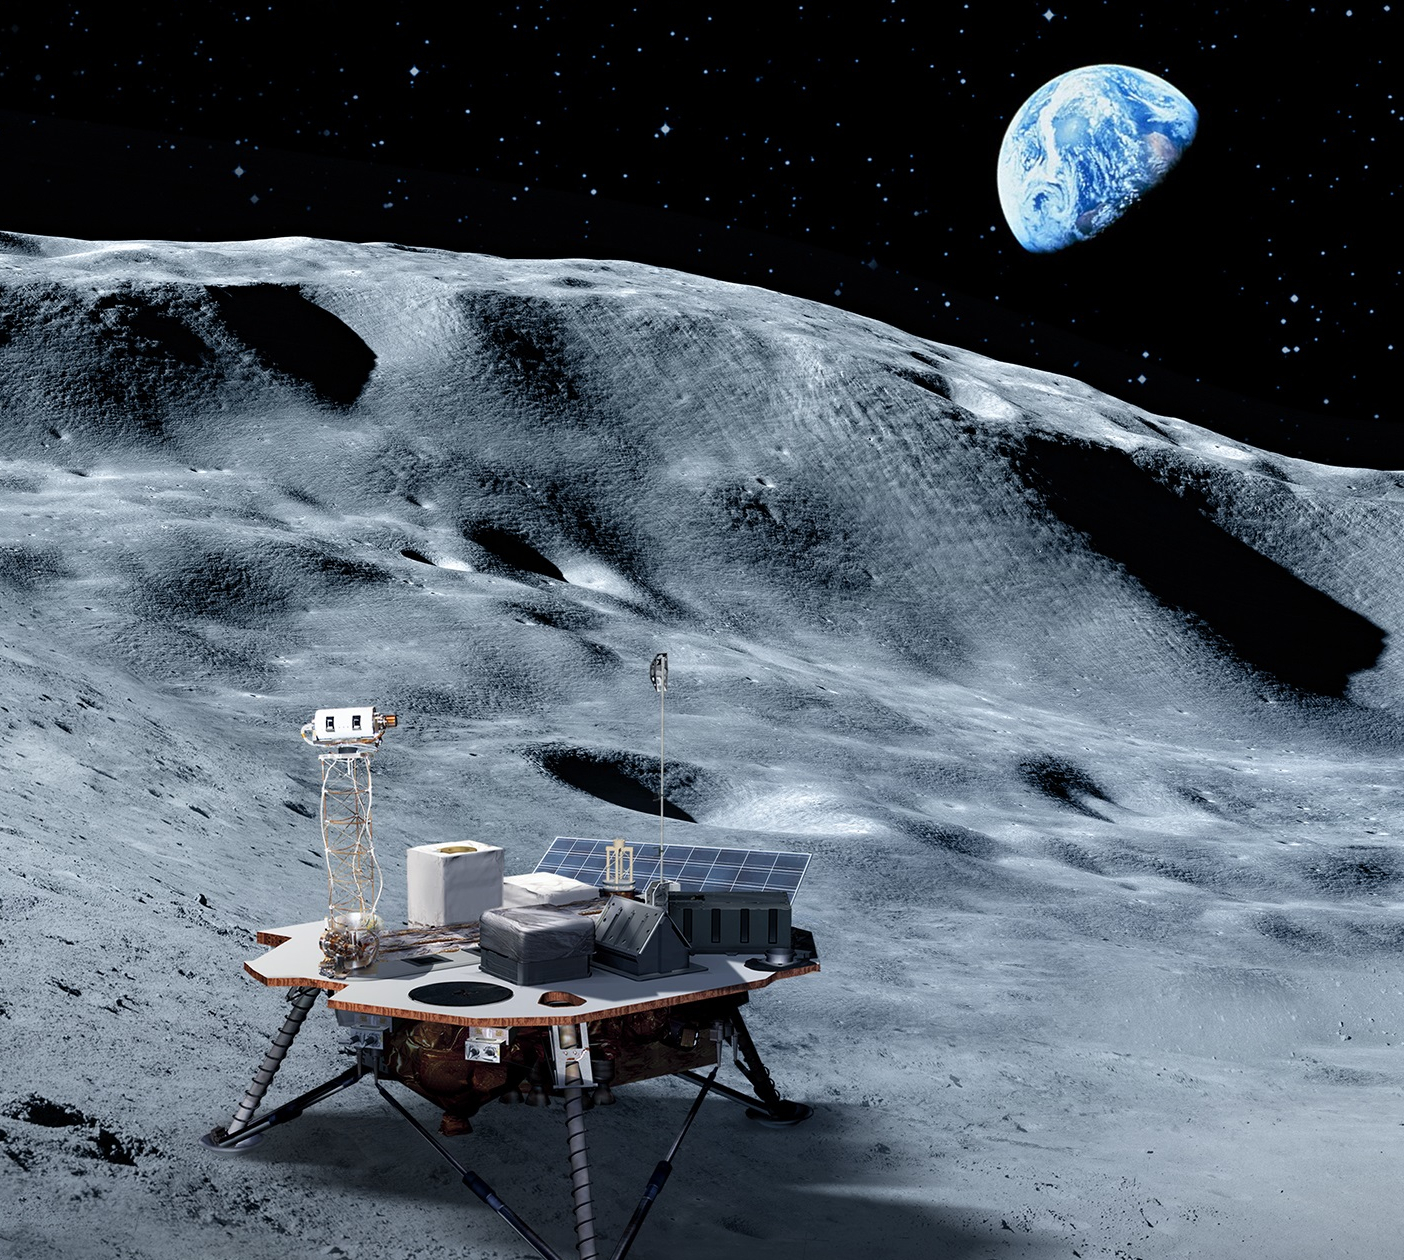 H NASA θα φέρει την Αθέατη Πλευρά της Σελήνης στο φως